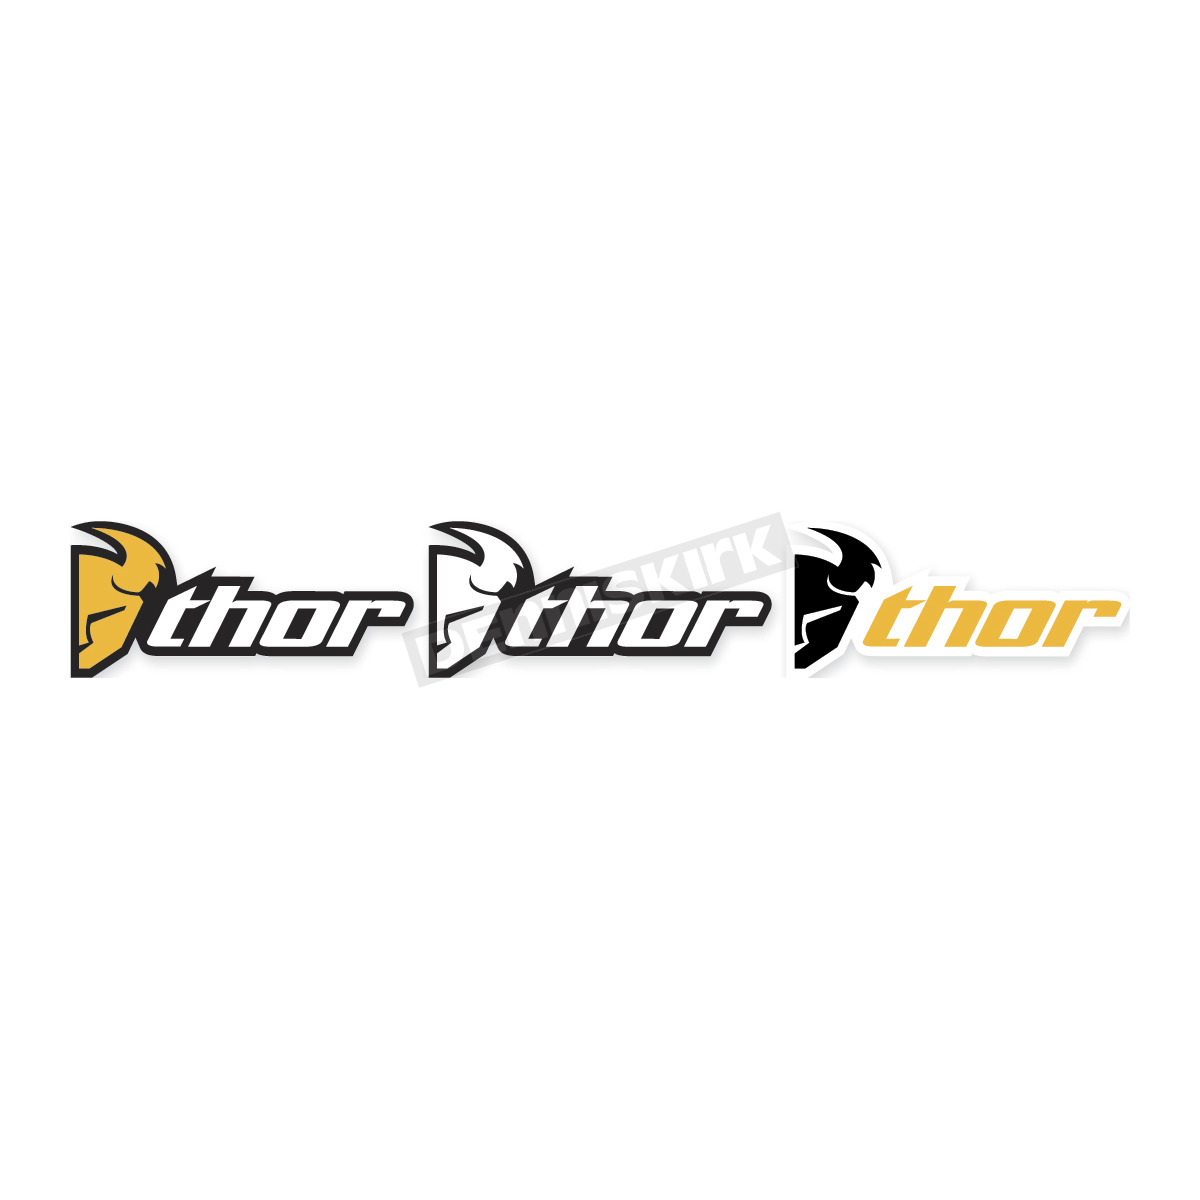 Thor Logo Decal Atv Dirt Bike